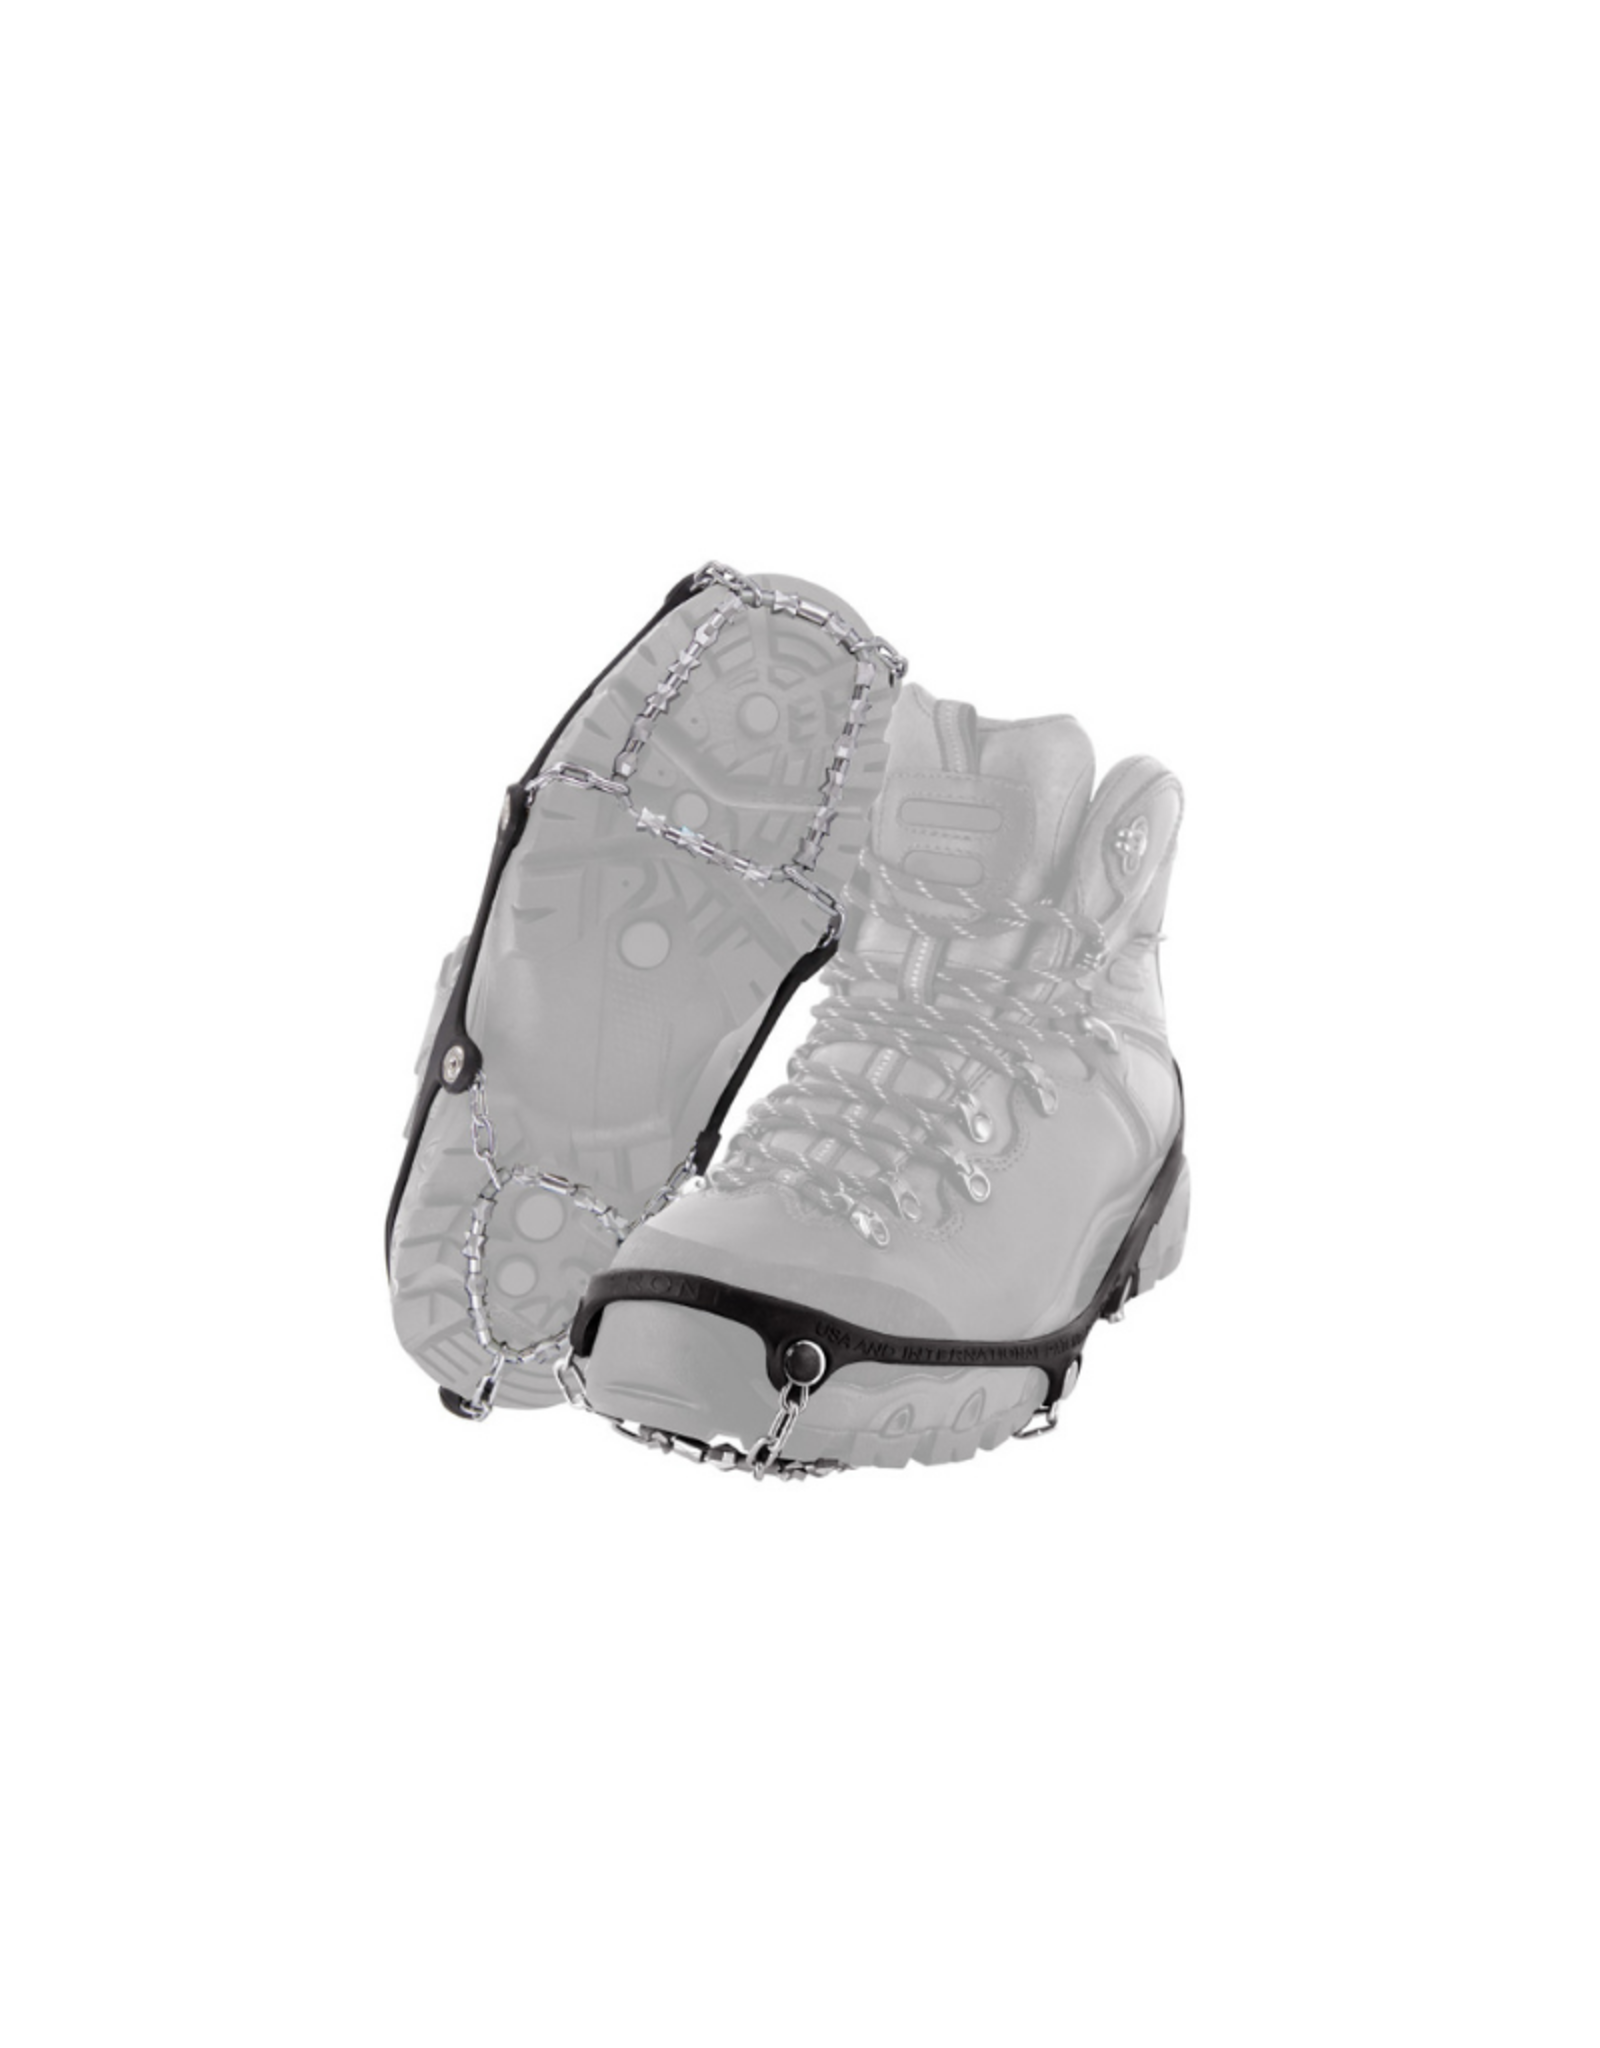 Yaktrax Diamondgrip